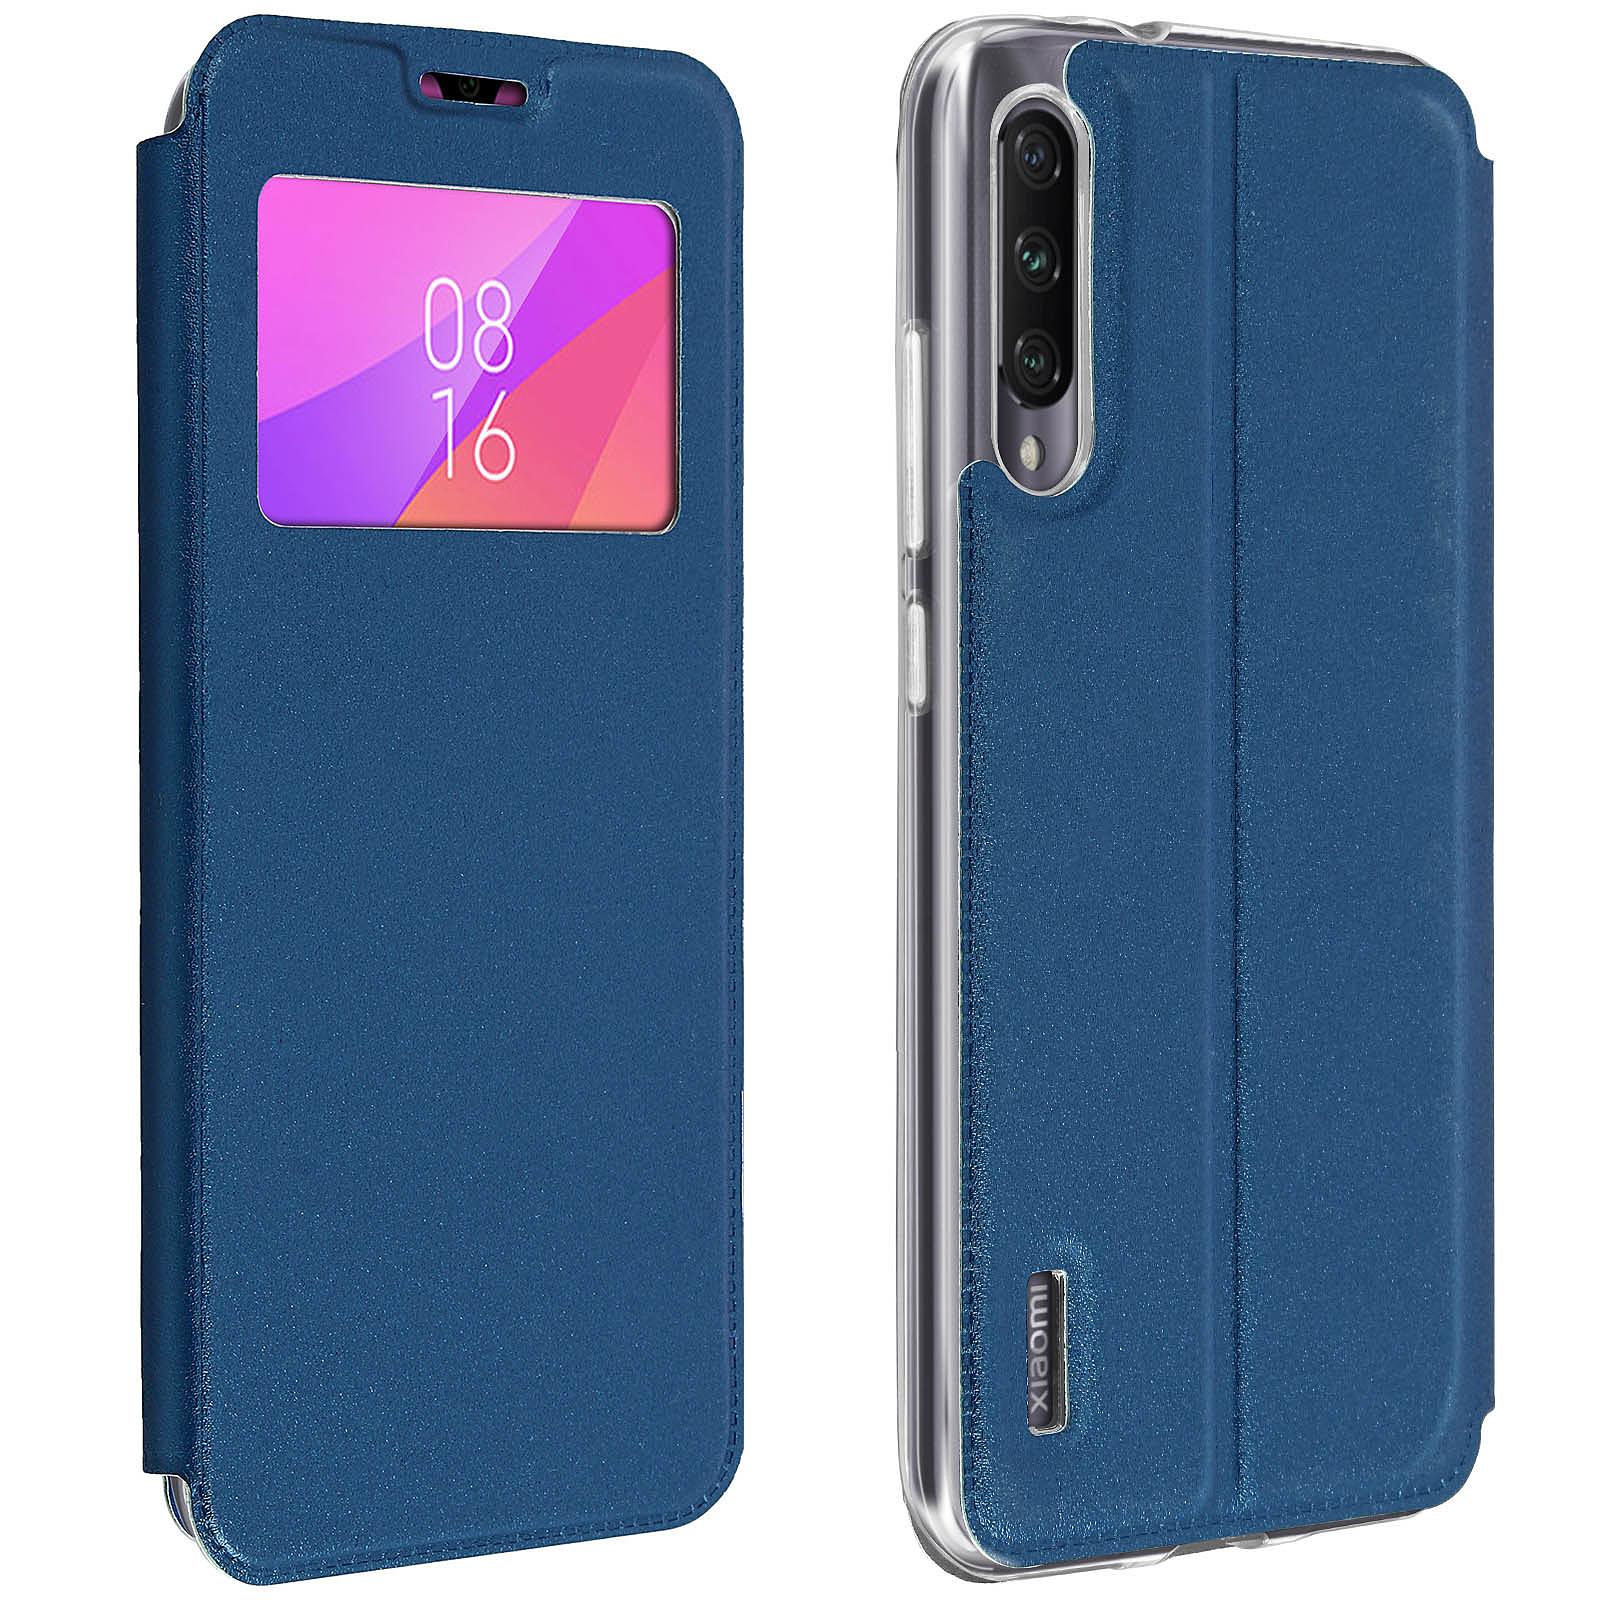 Avizar Etui folio Bleu pour Xiaomi Mi A3